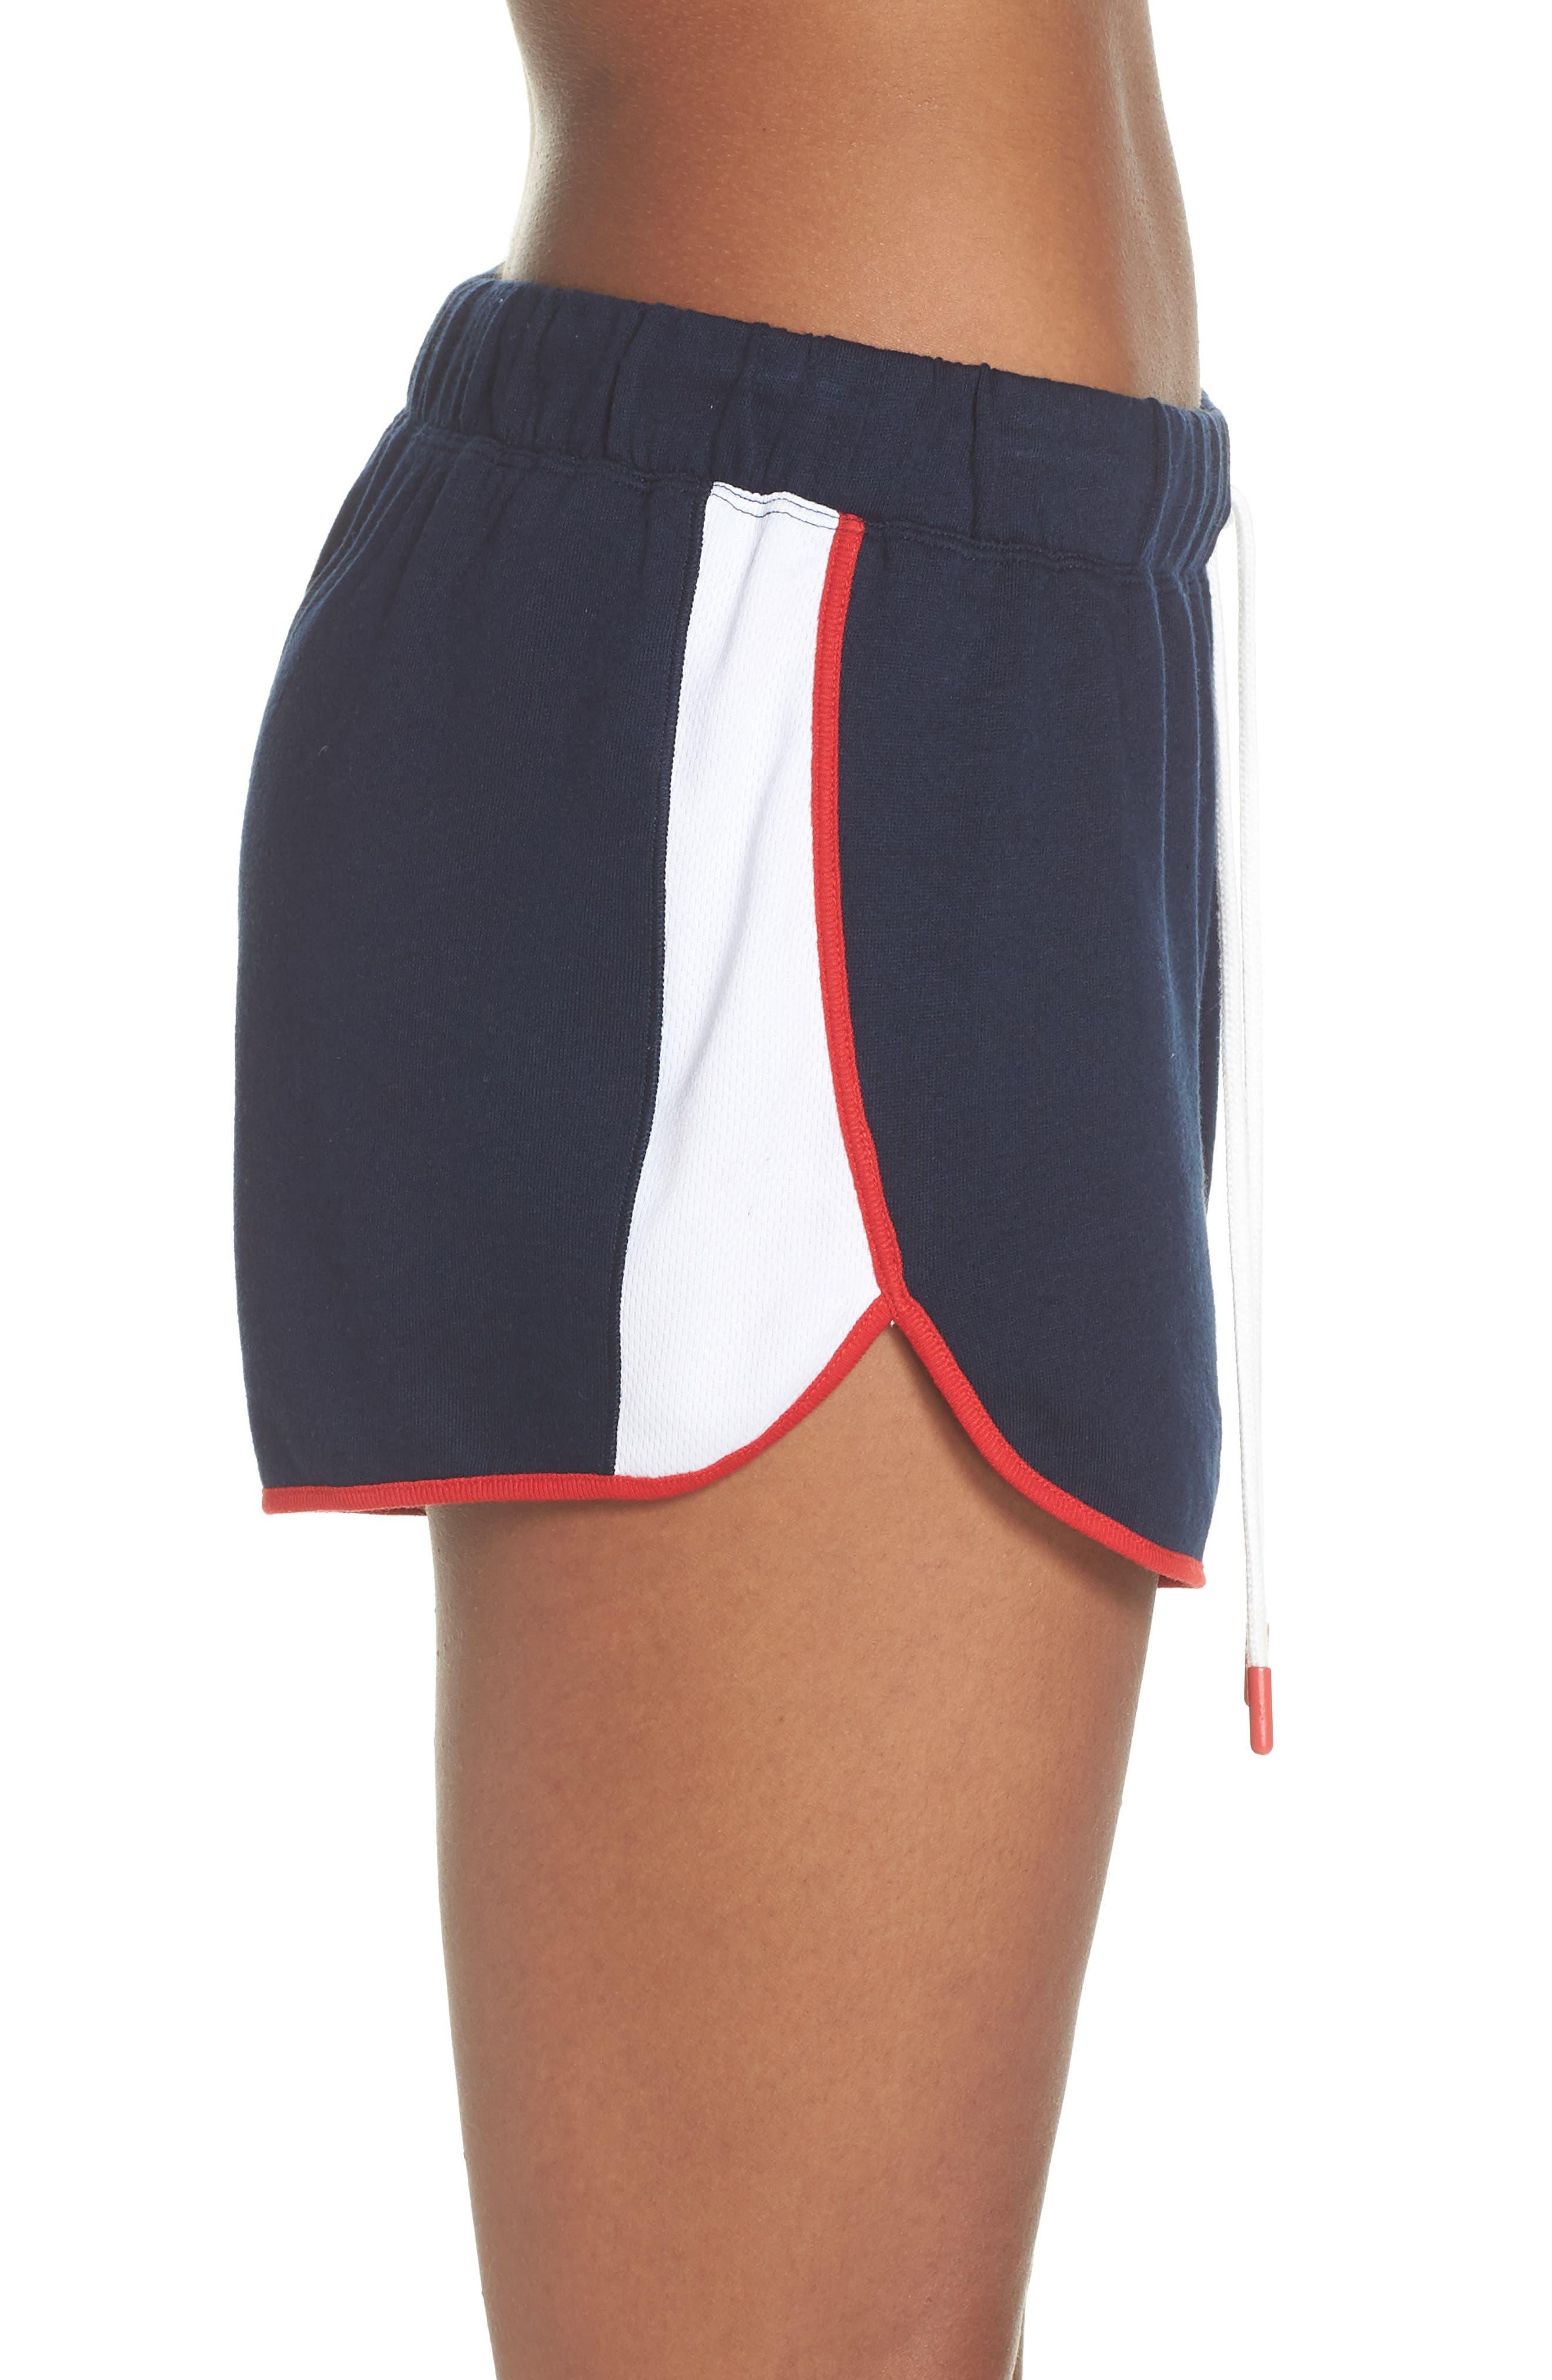 Lounge Shorts,                             Alternate thumbnail 3, color,                             429